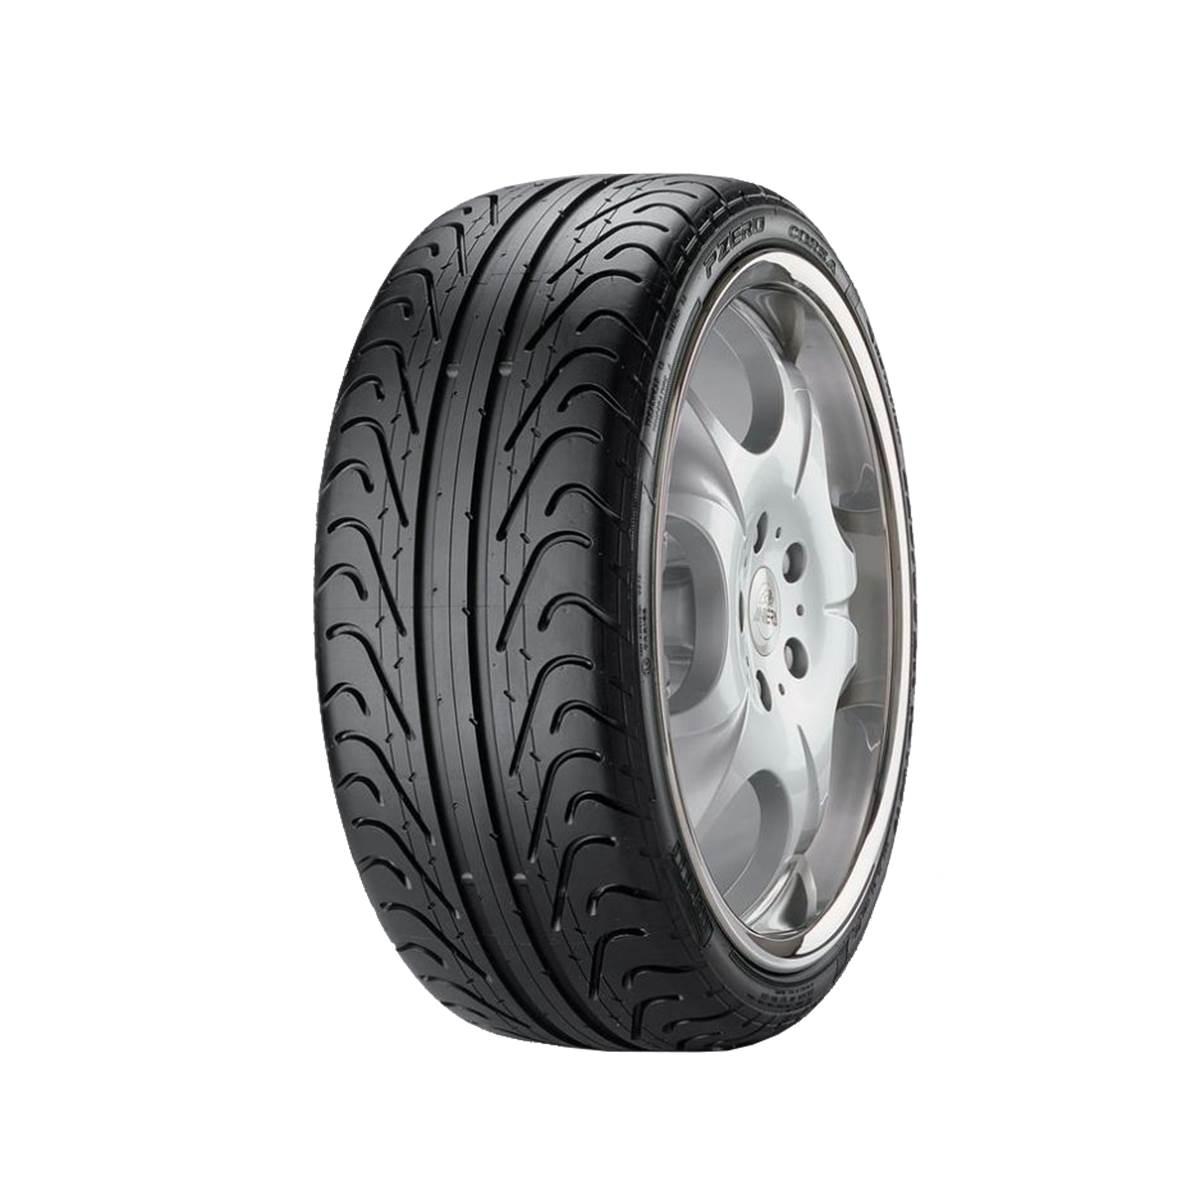 Pneu Pirelli 225/35R19 84Z Pzero Corsa Direzionale